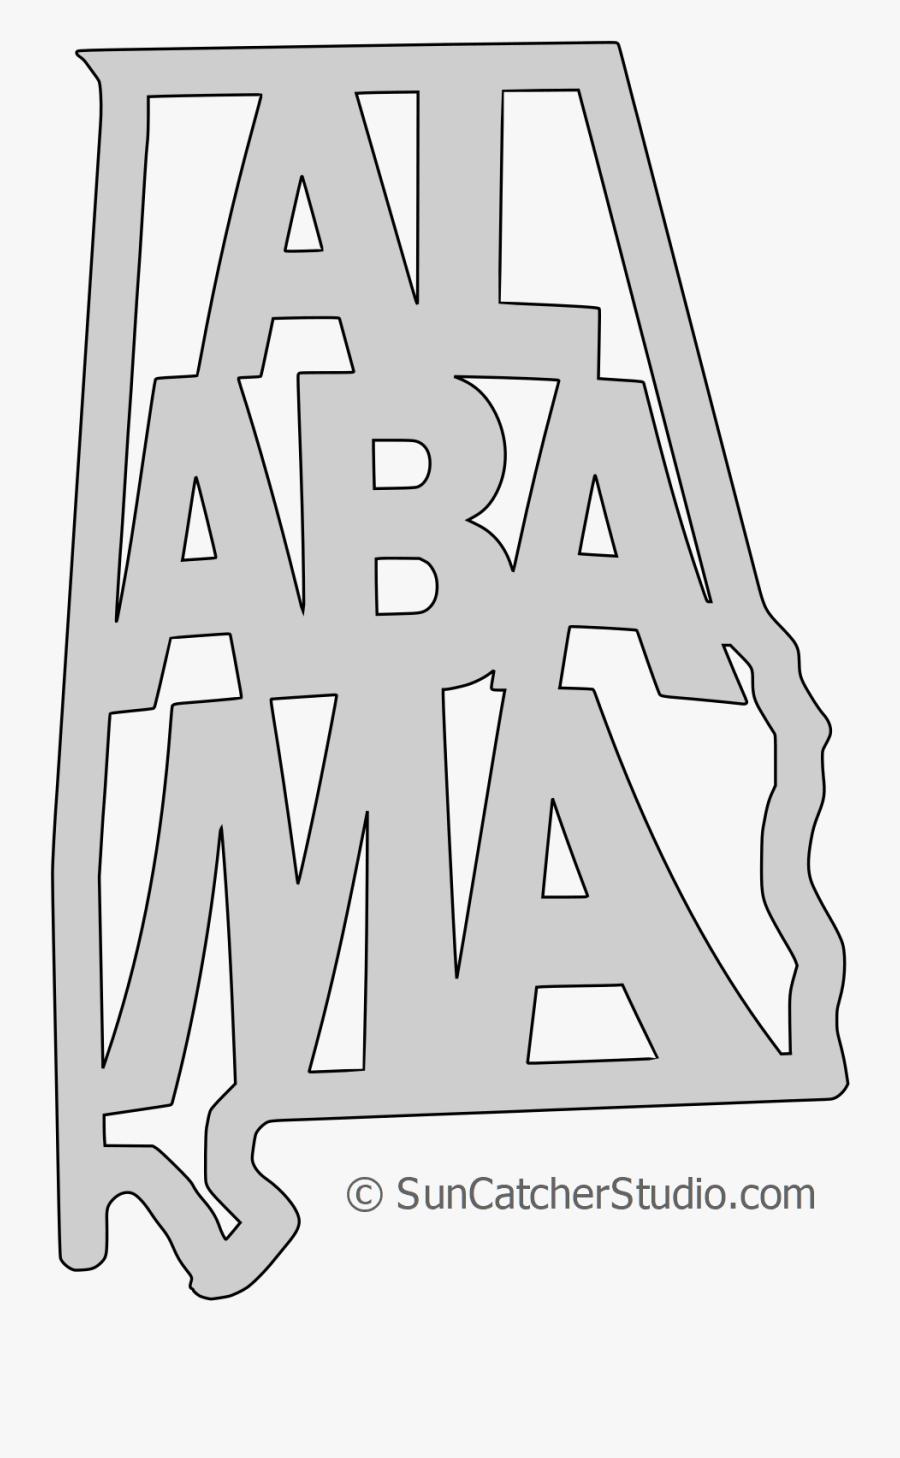 Transparent State Alabama Outline, Transparent Clipart